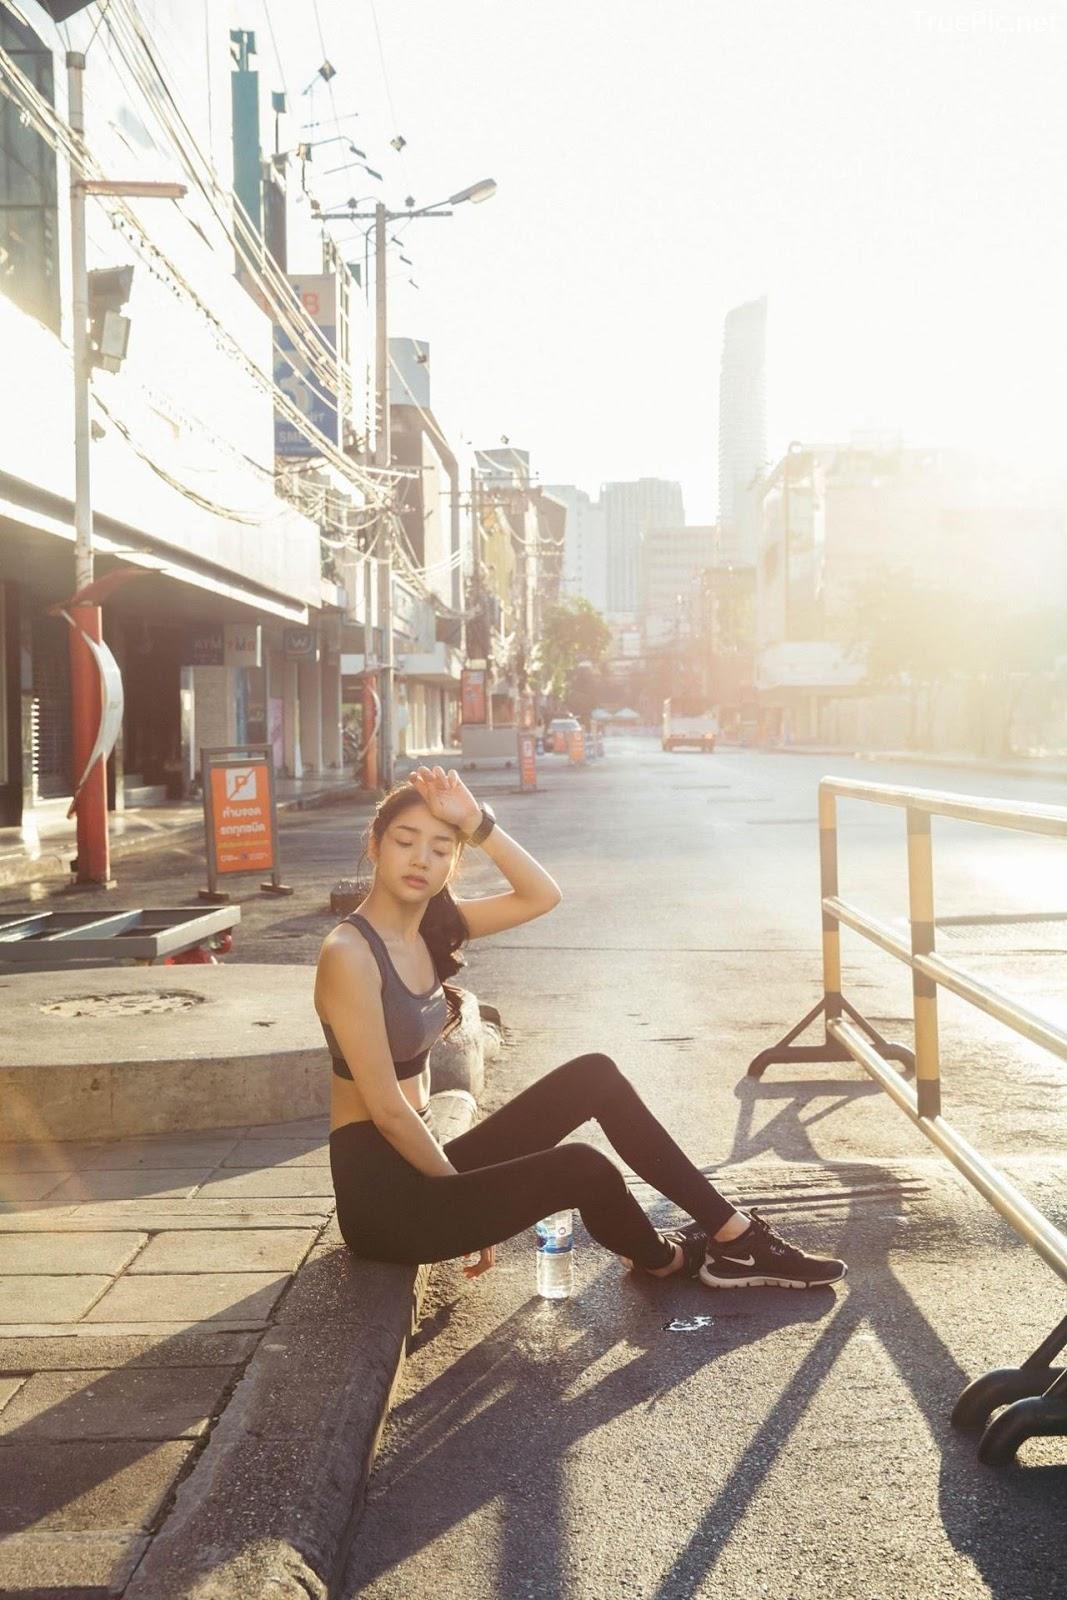 Image-Thailand-Pretty-Model-Anun-Sasinun-Beautiful-Fitness-Girl-TruePic.net- Picture-8